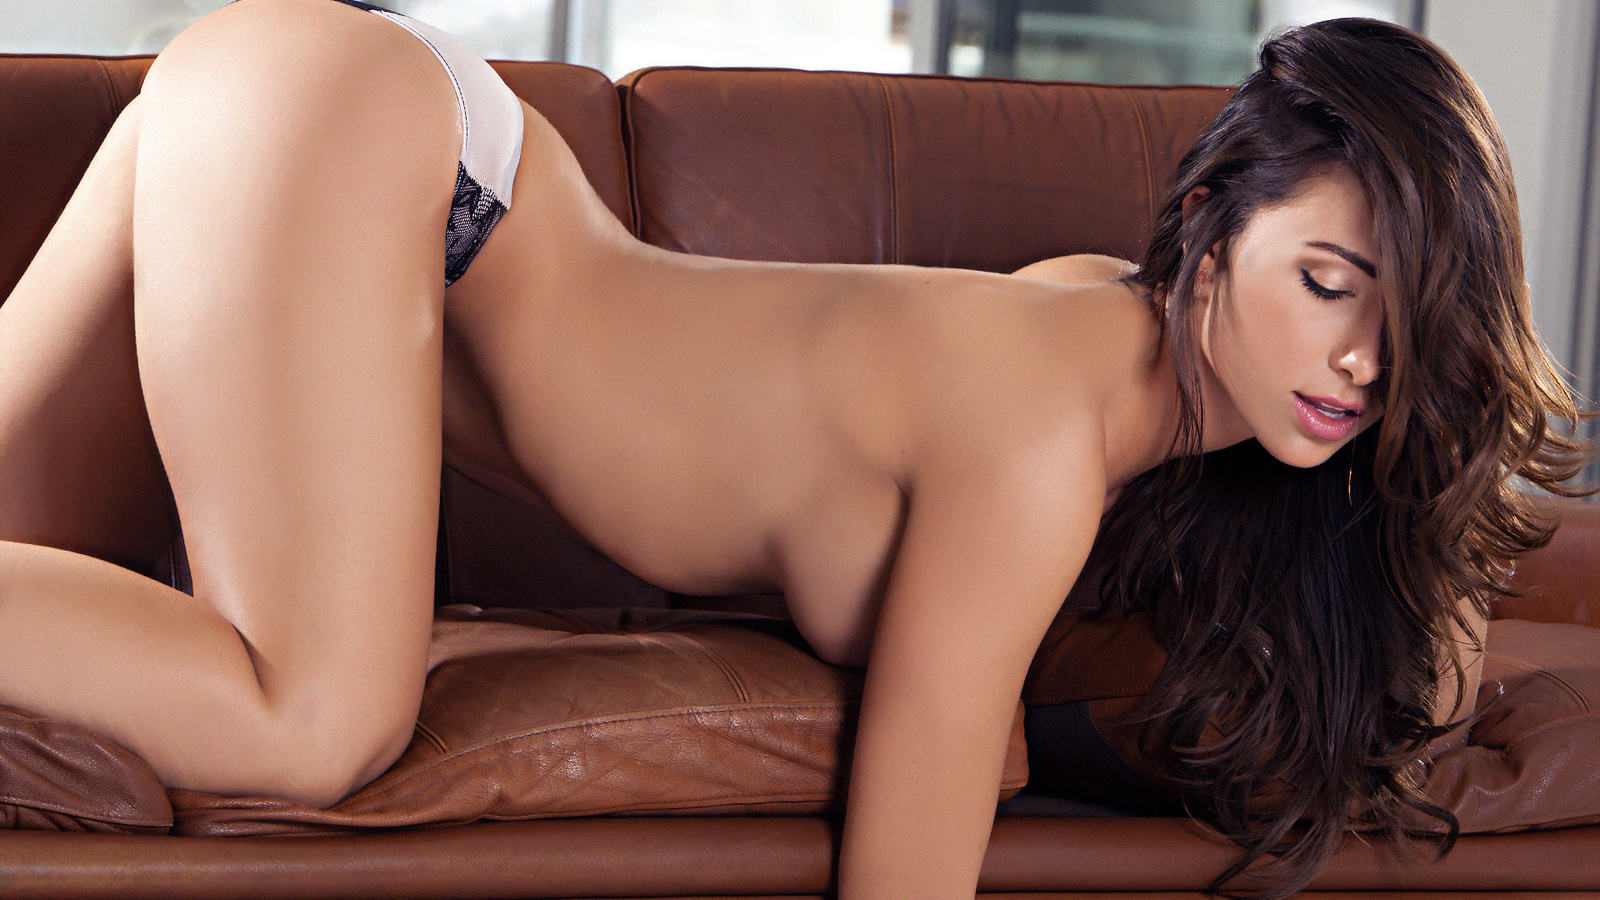 девушка, шатенка, позирует, секси, фото, casey connelly, грудь, губки